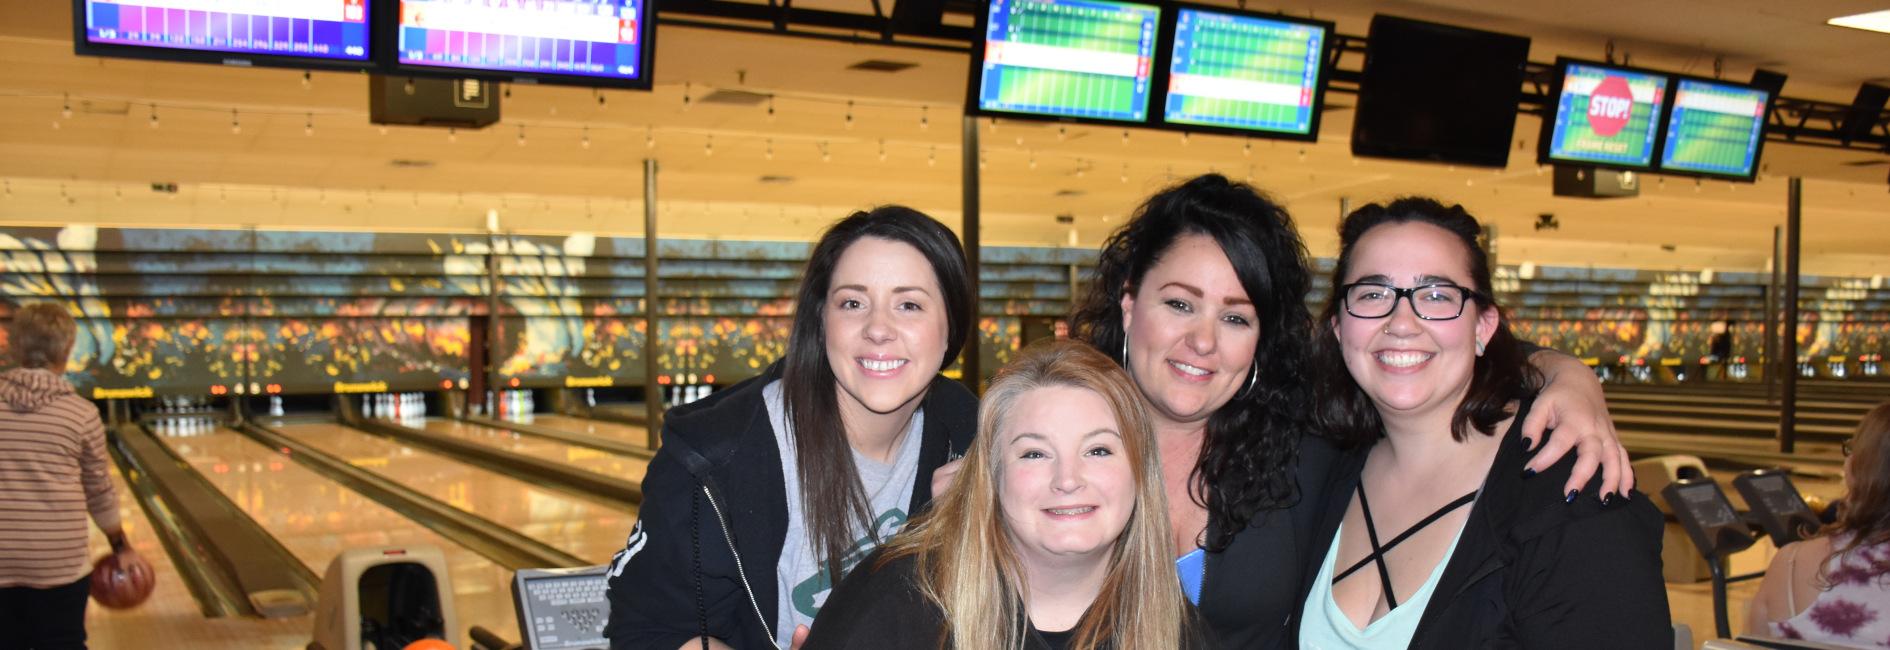 Bowling 2019 Slider.JPG